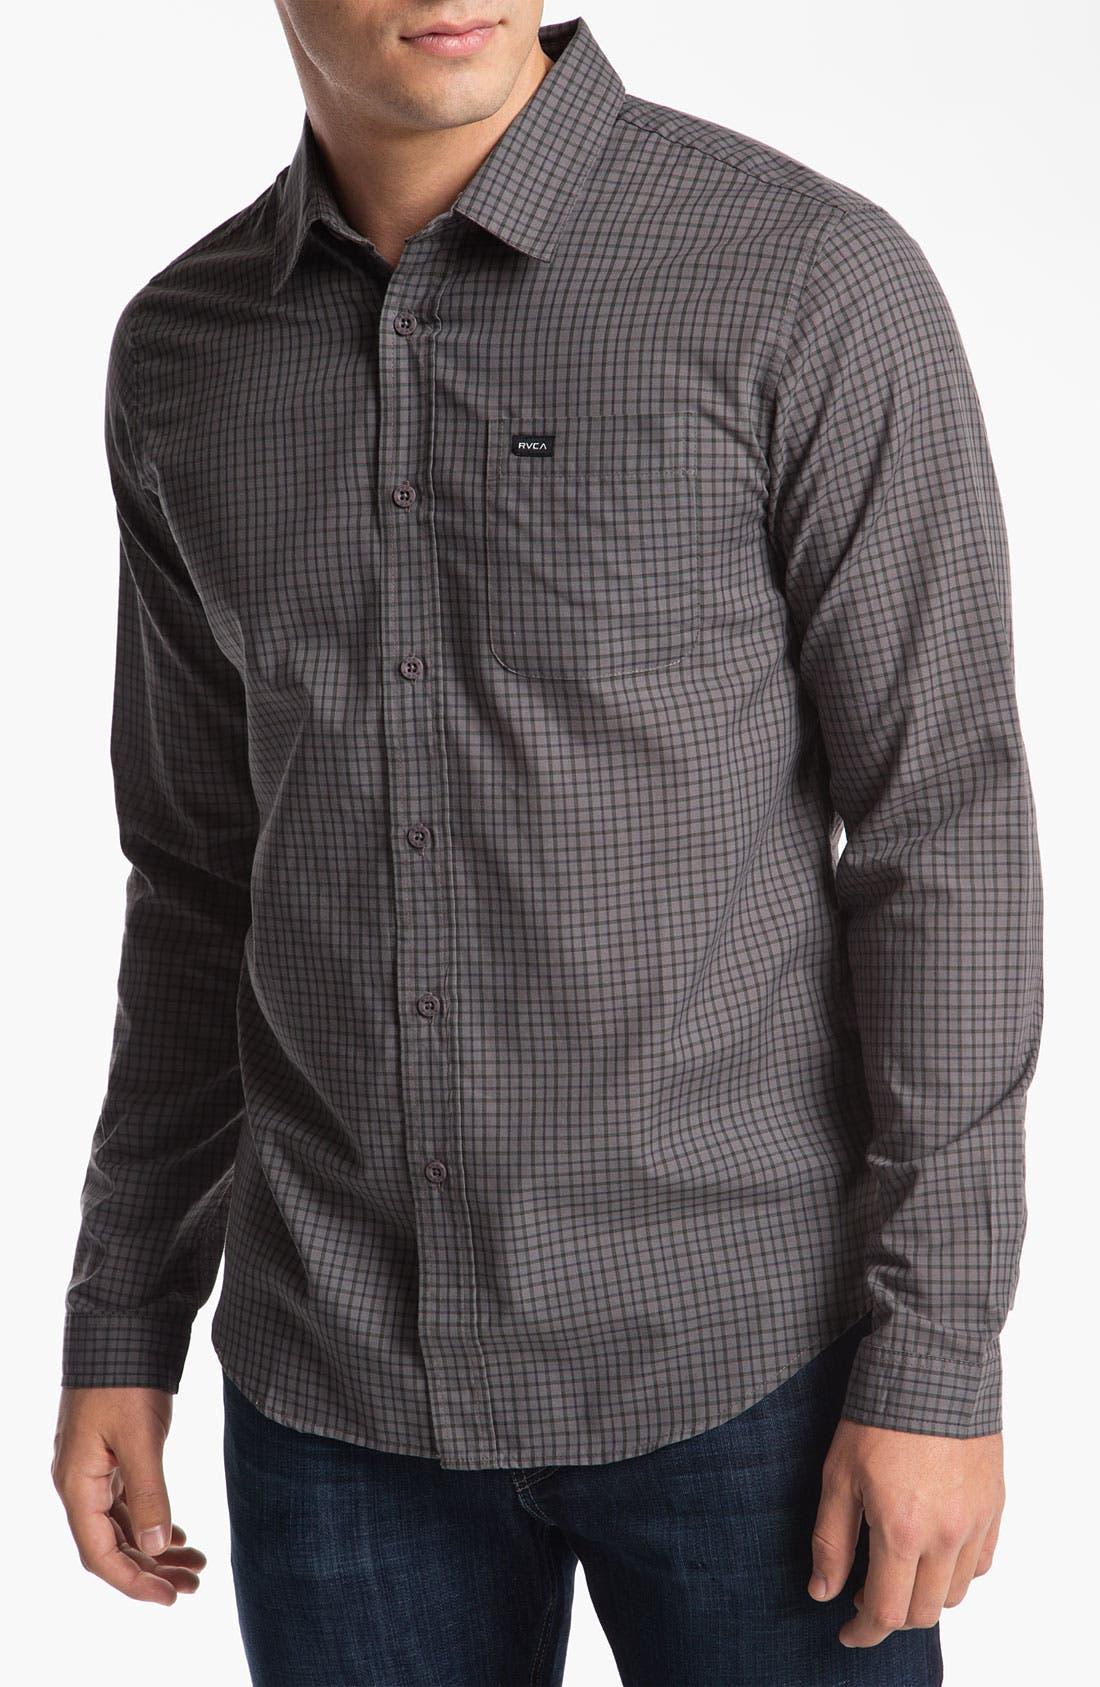 Alternate Image 1 Selected - RVCA 'Borealis' Check Woven Shirt